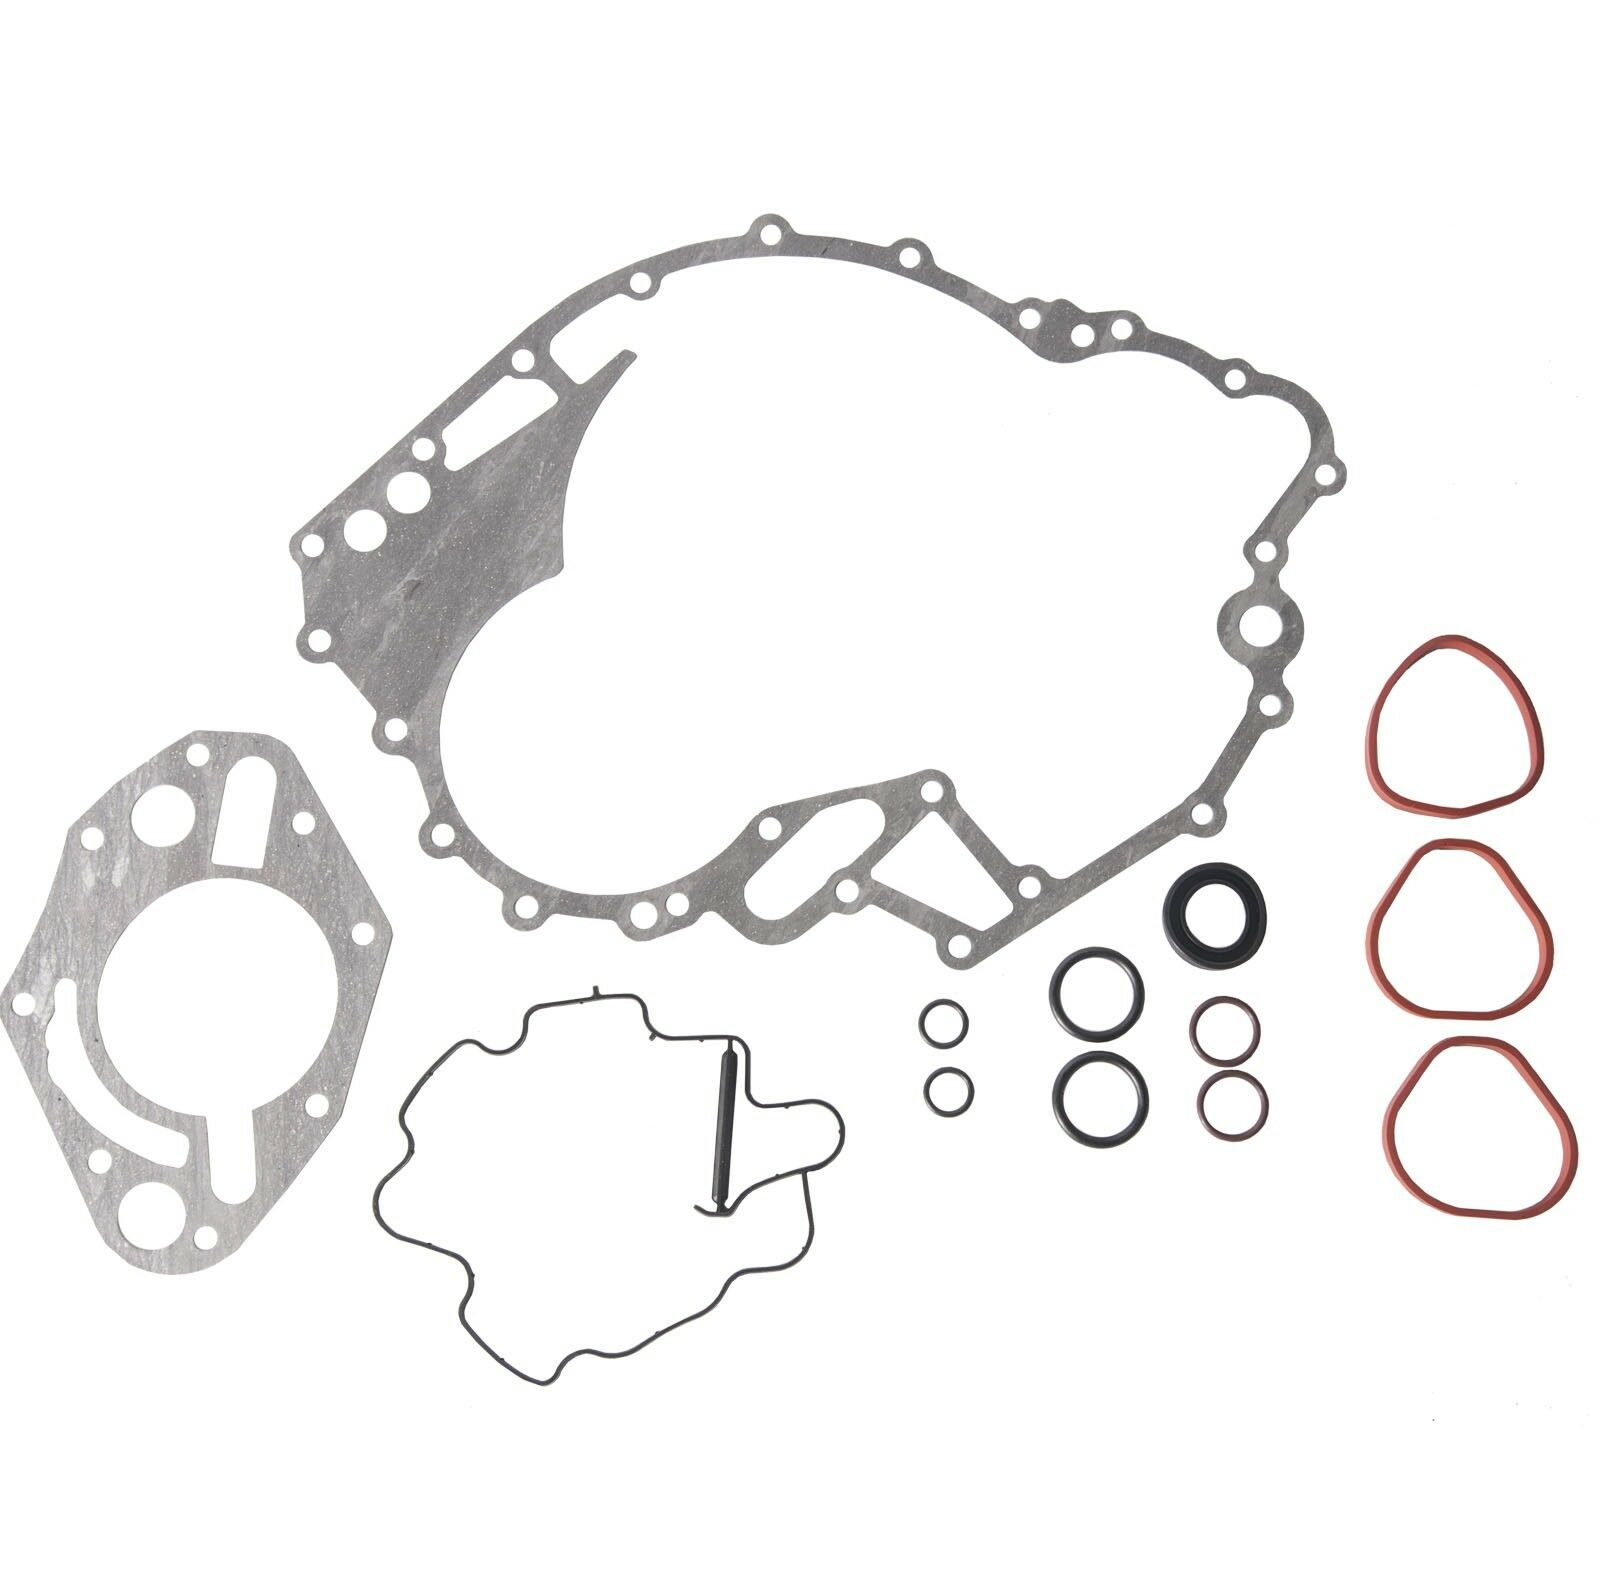 Seadoo GTX 4-Tec Engine Installation Gasket Kit GTI RXP